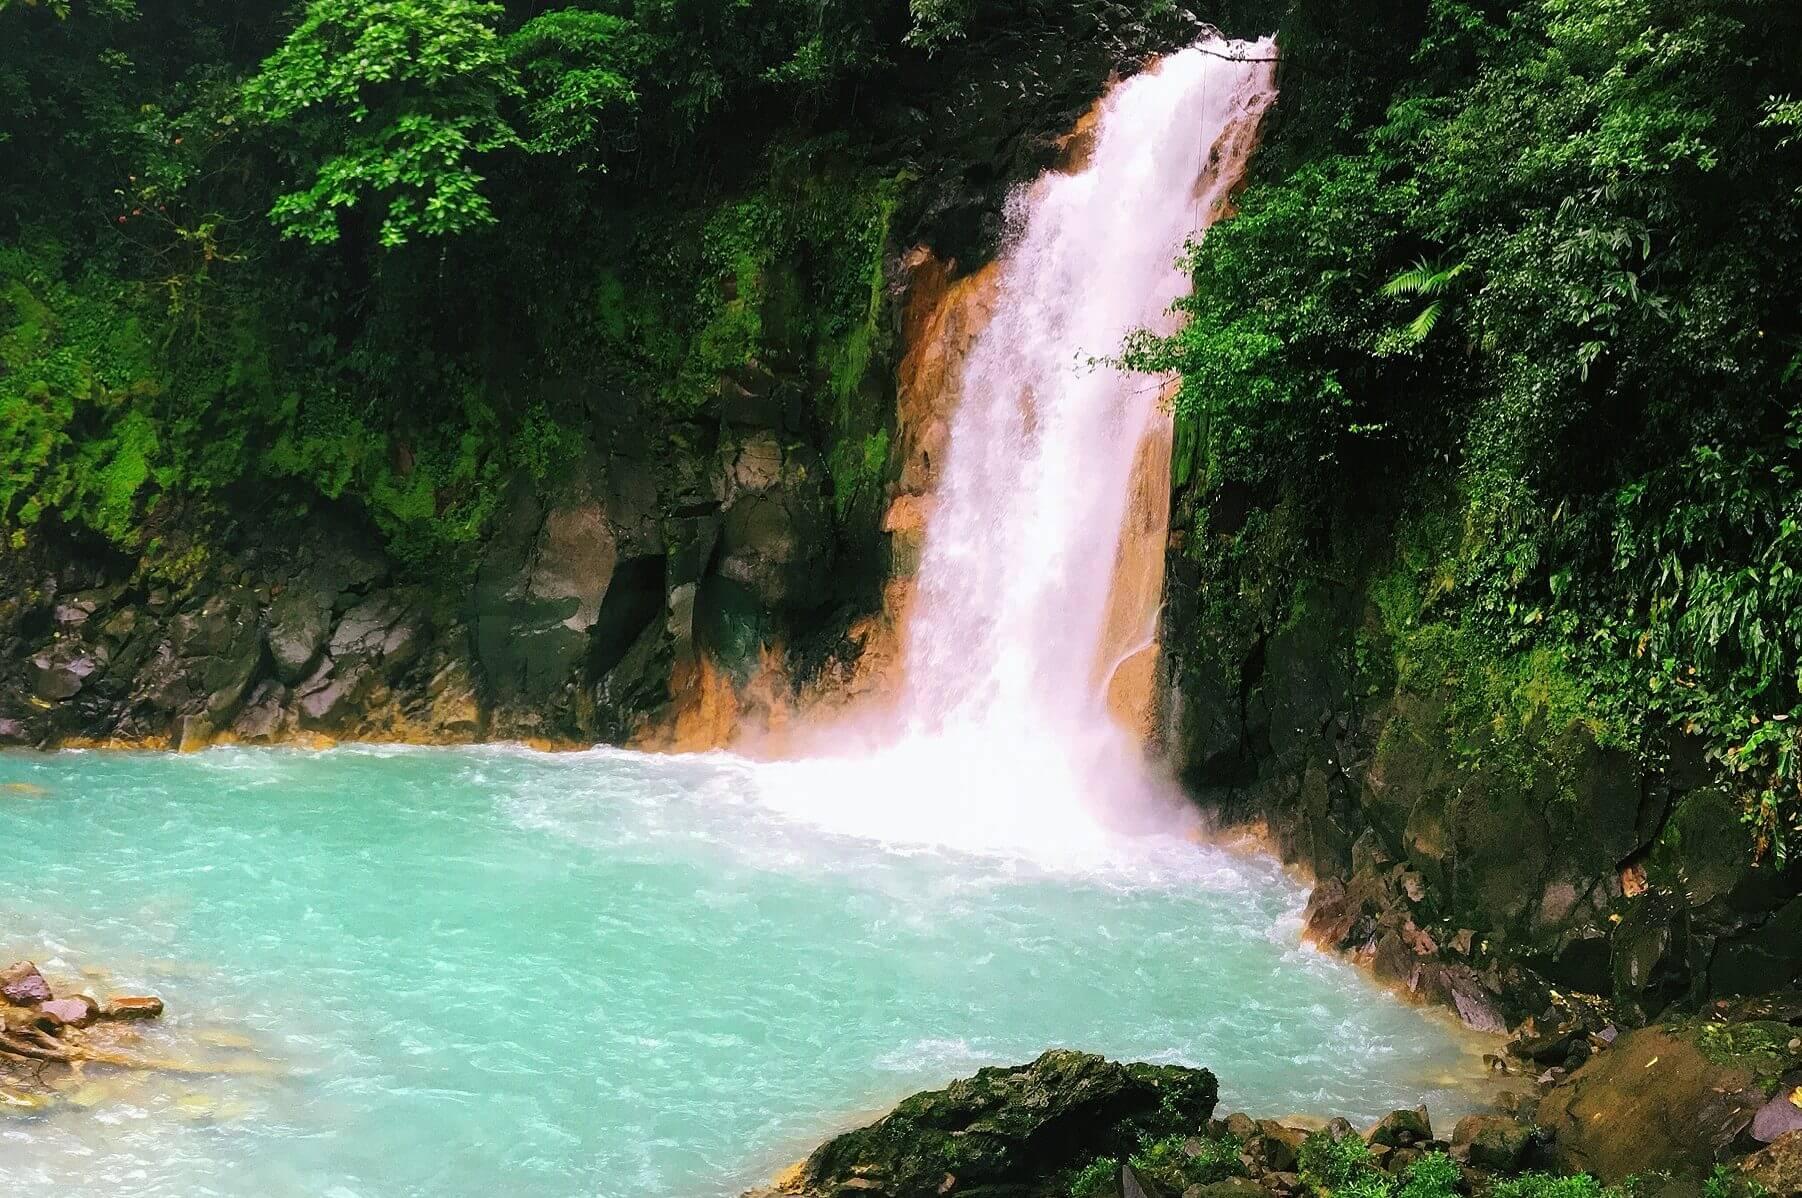 Rio-Celeste-guide-voyage-travel-guide